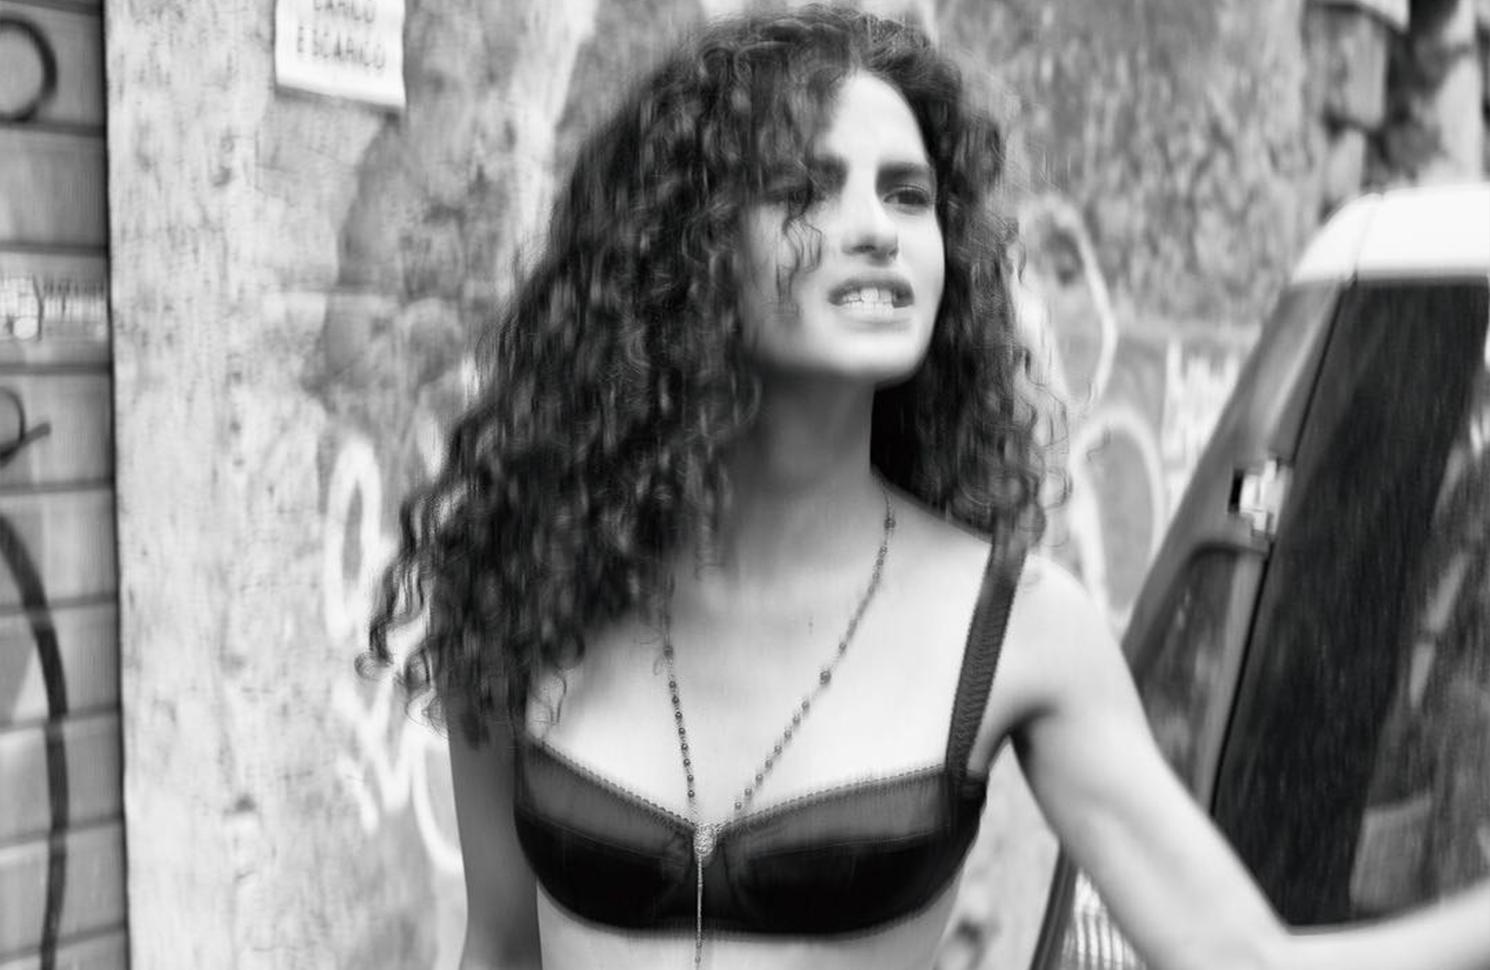 Photos Chiara Scelsi naked (69 photos), Pussy, Bikini, Boobs, swimsuit 2006